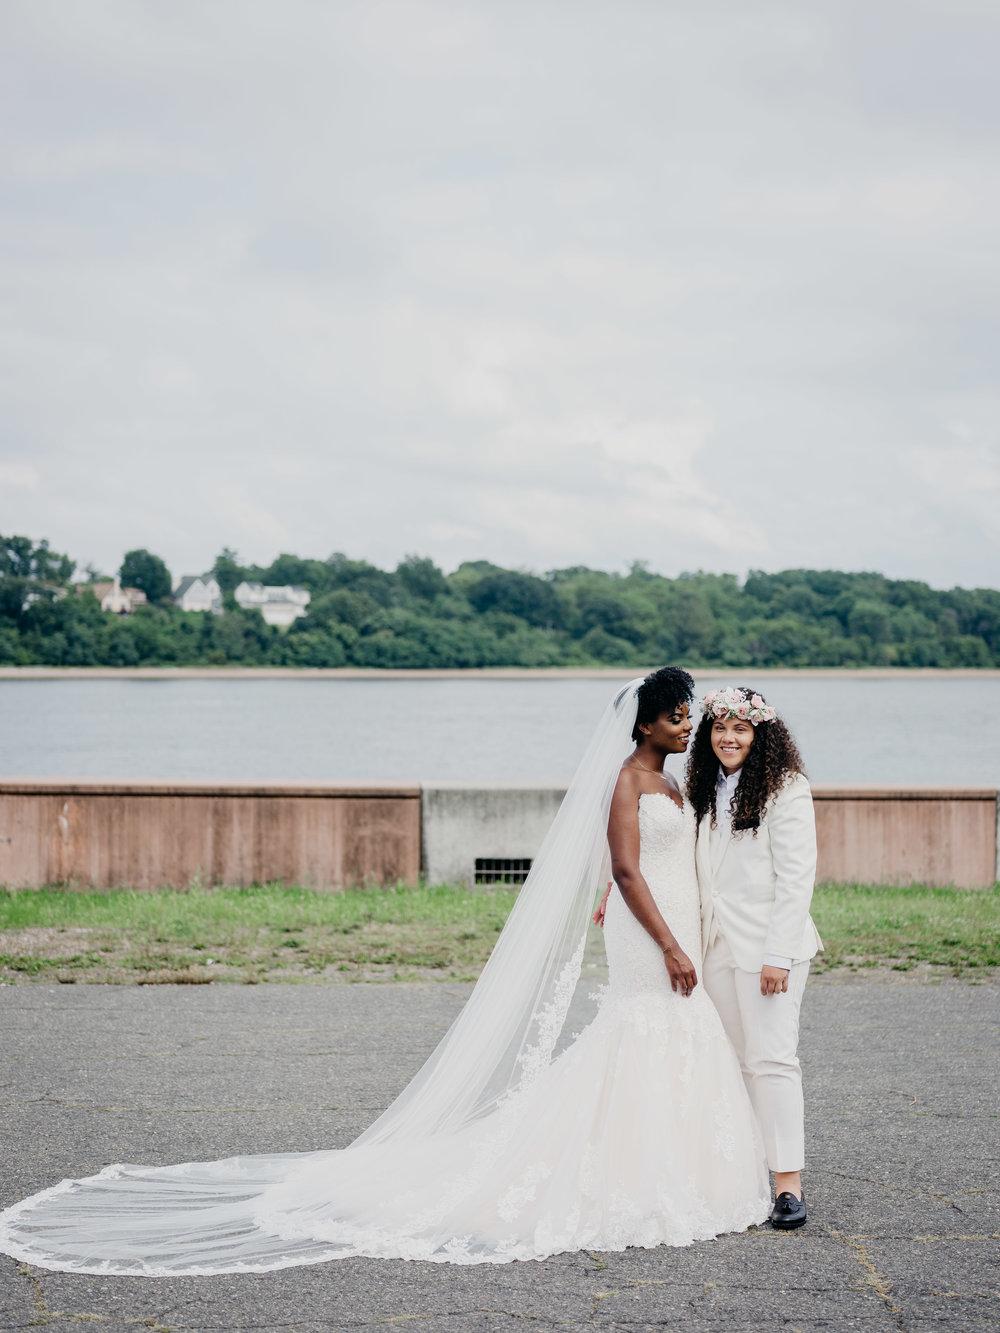 WSPCO-08122017-DaJa-Odalis-Wedding-Preview-72.jpg